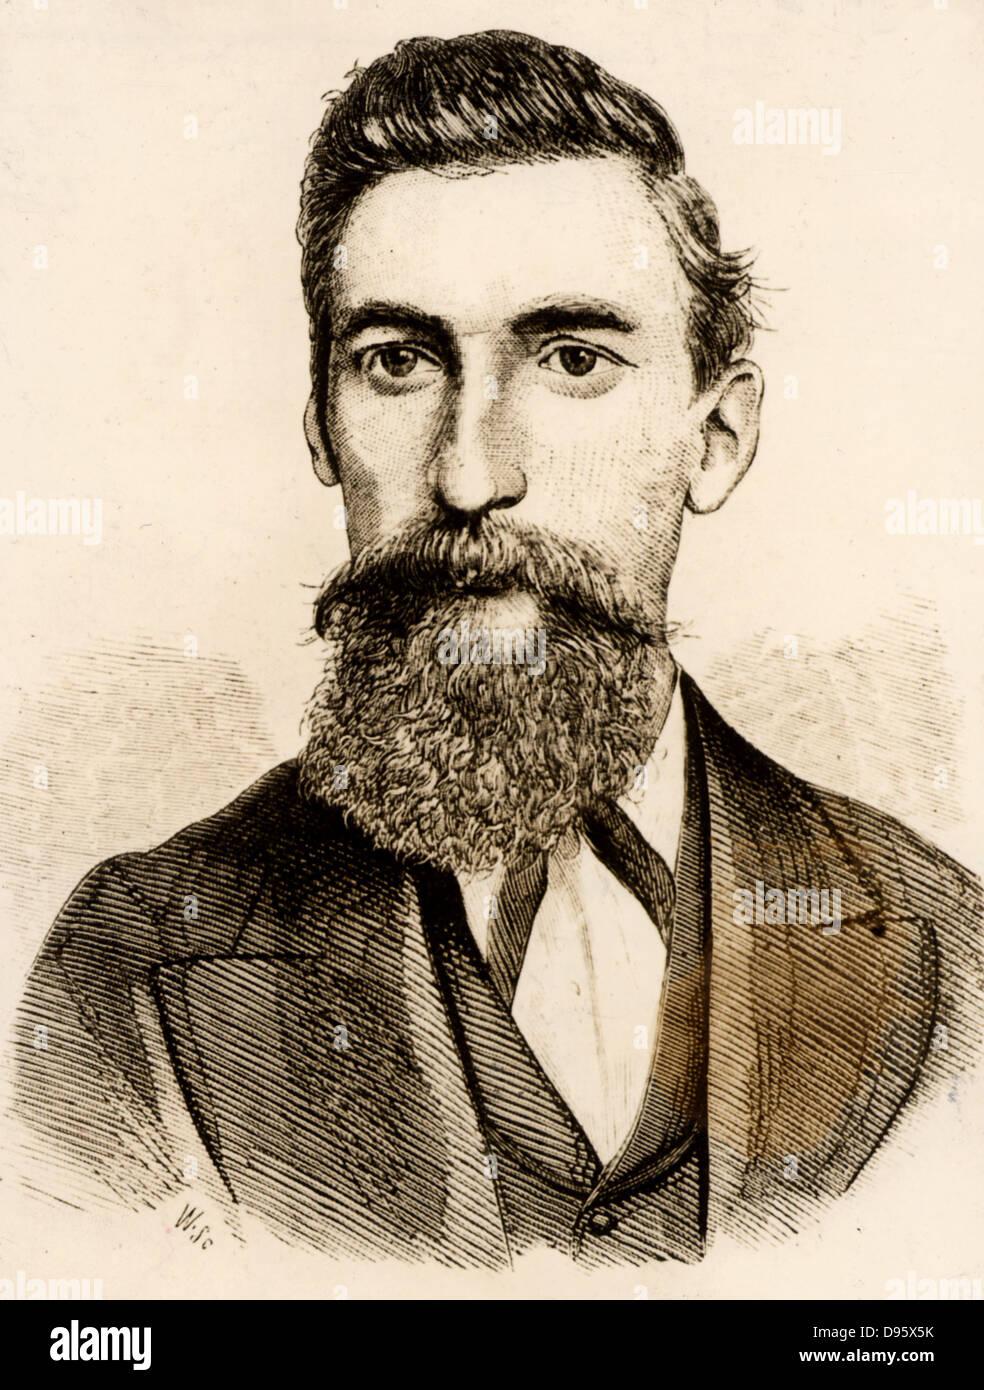 Robert Applegarth (1834-1924) prominent English trade union leader. - Stock Image